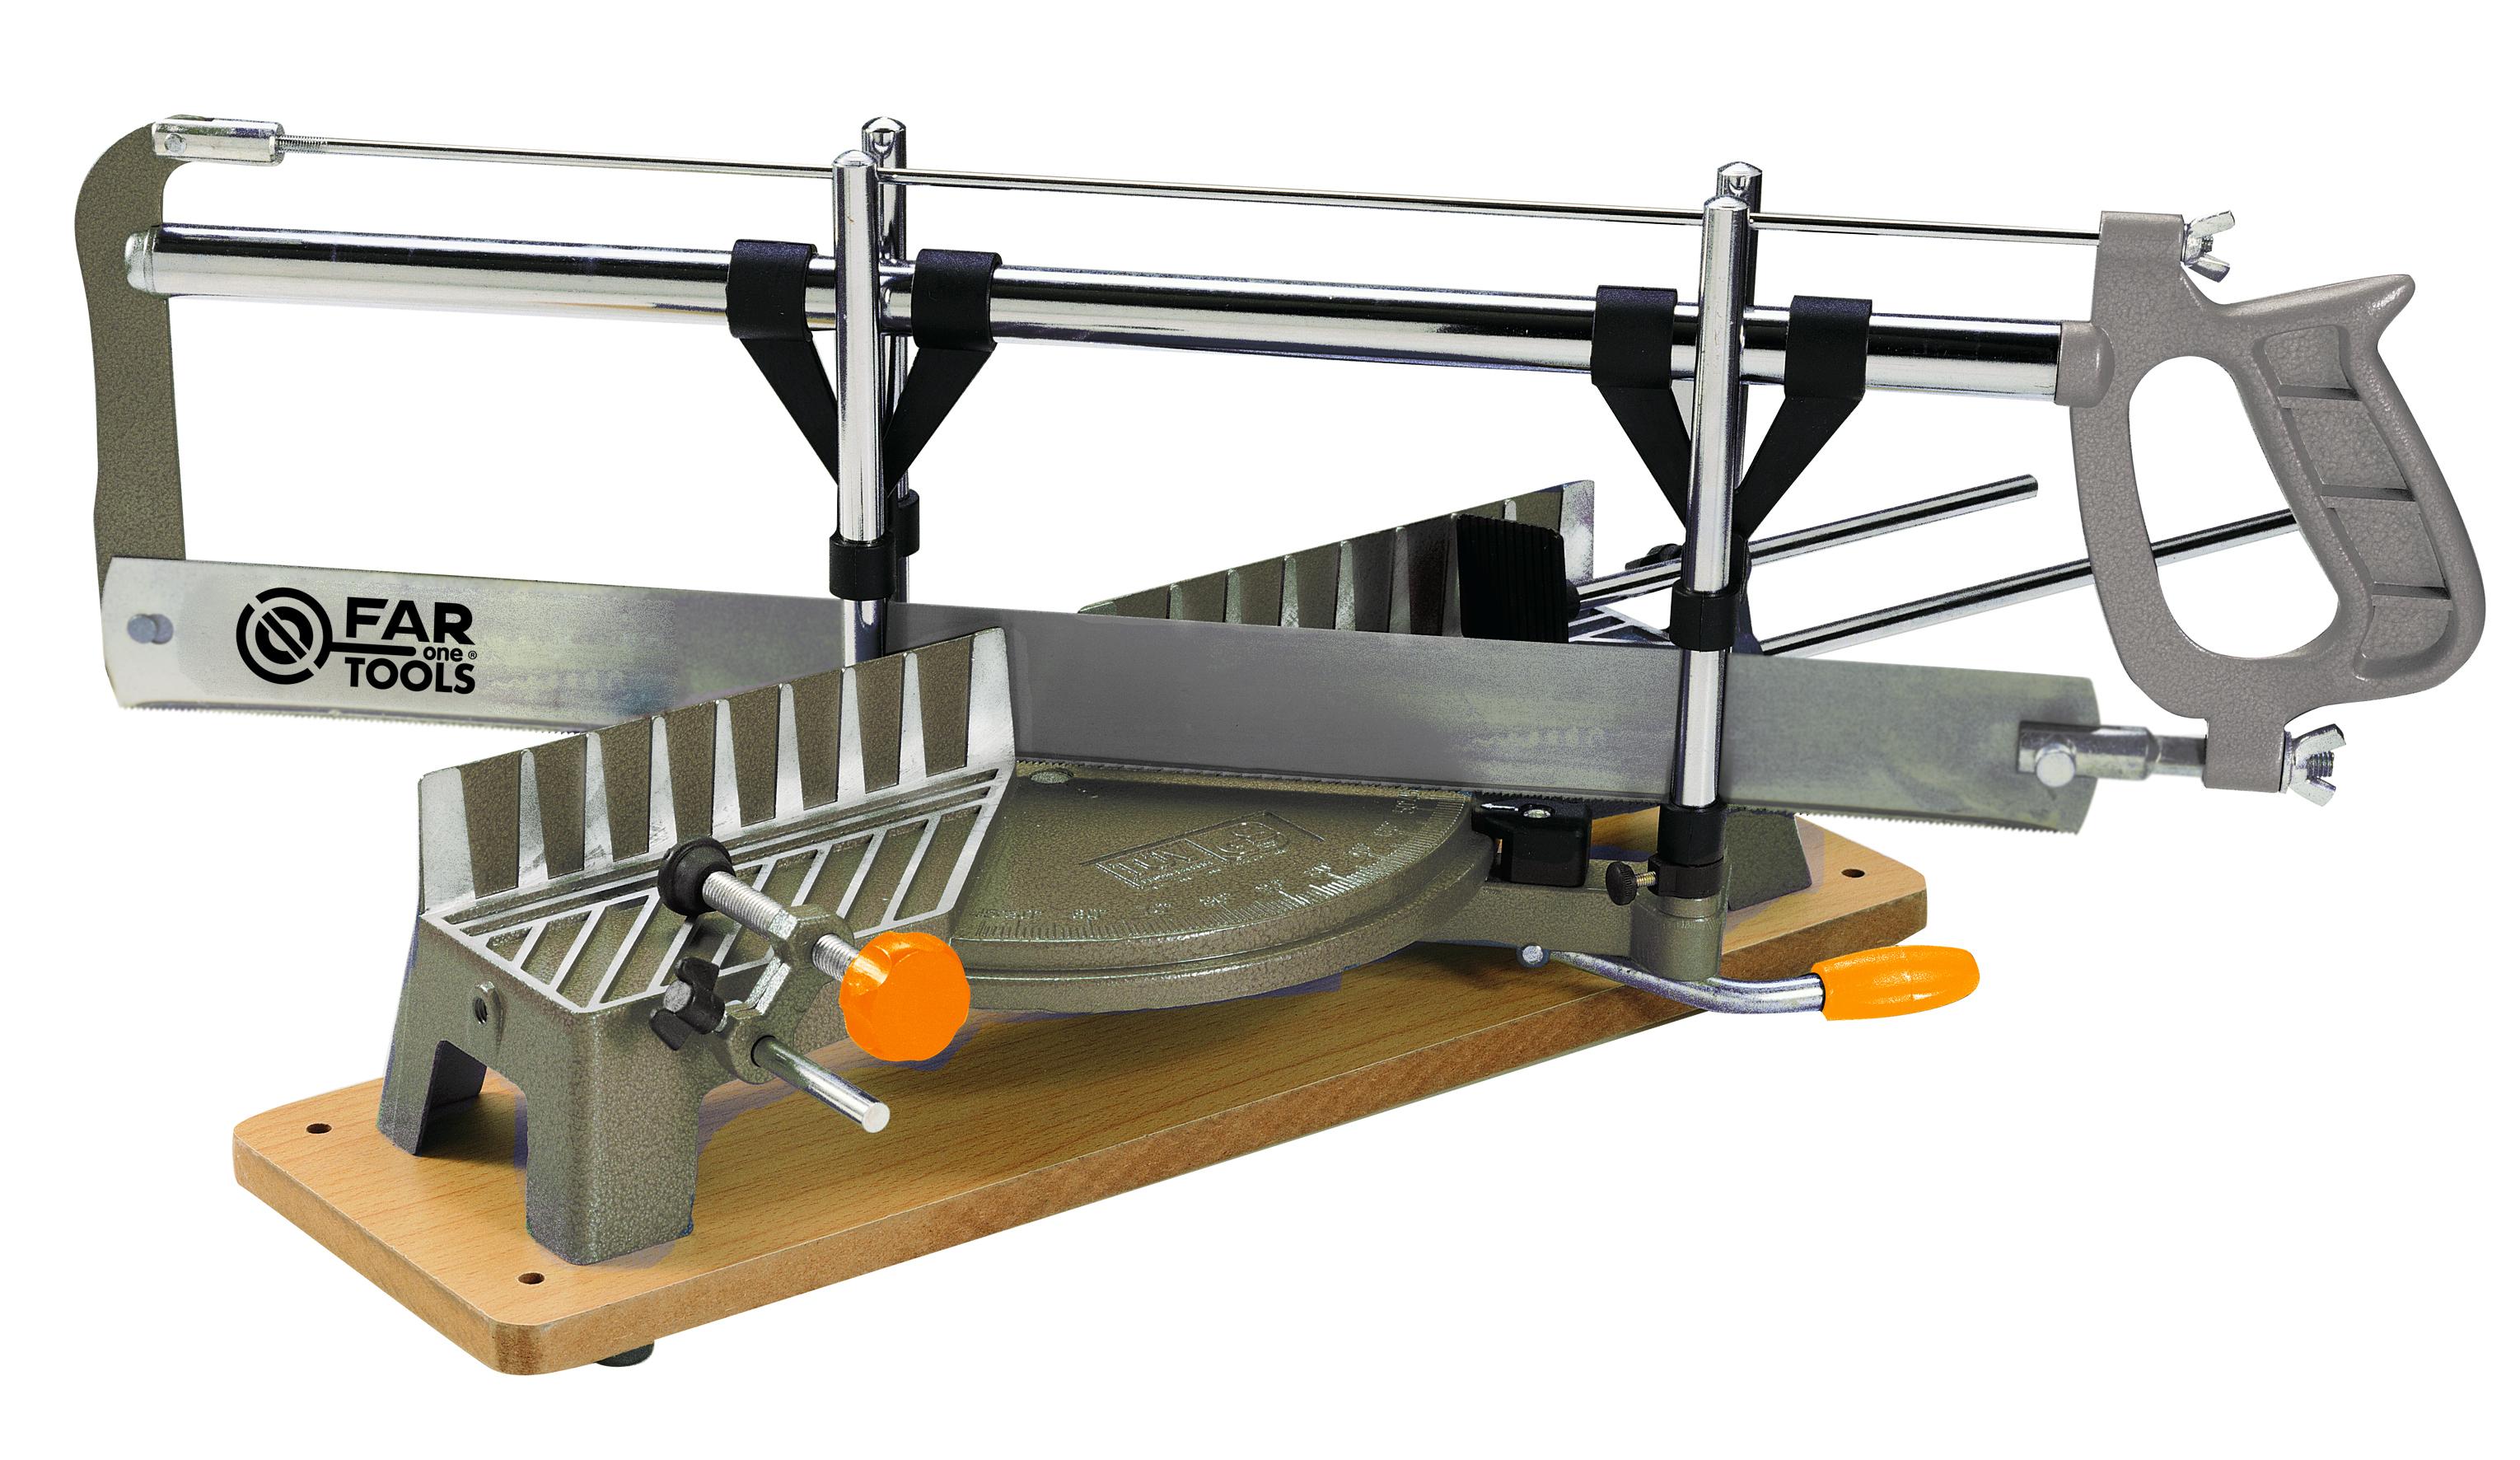 fartools meuleuse dangle 1800 w disque 230 mm. Black Bedroom Furniture Sets. Home Design Ideas